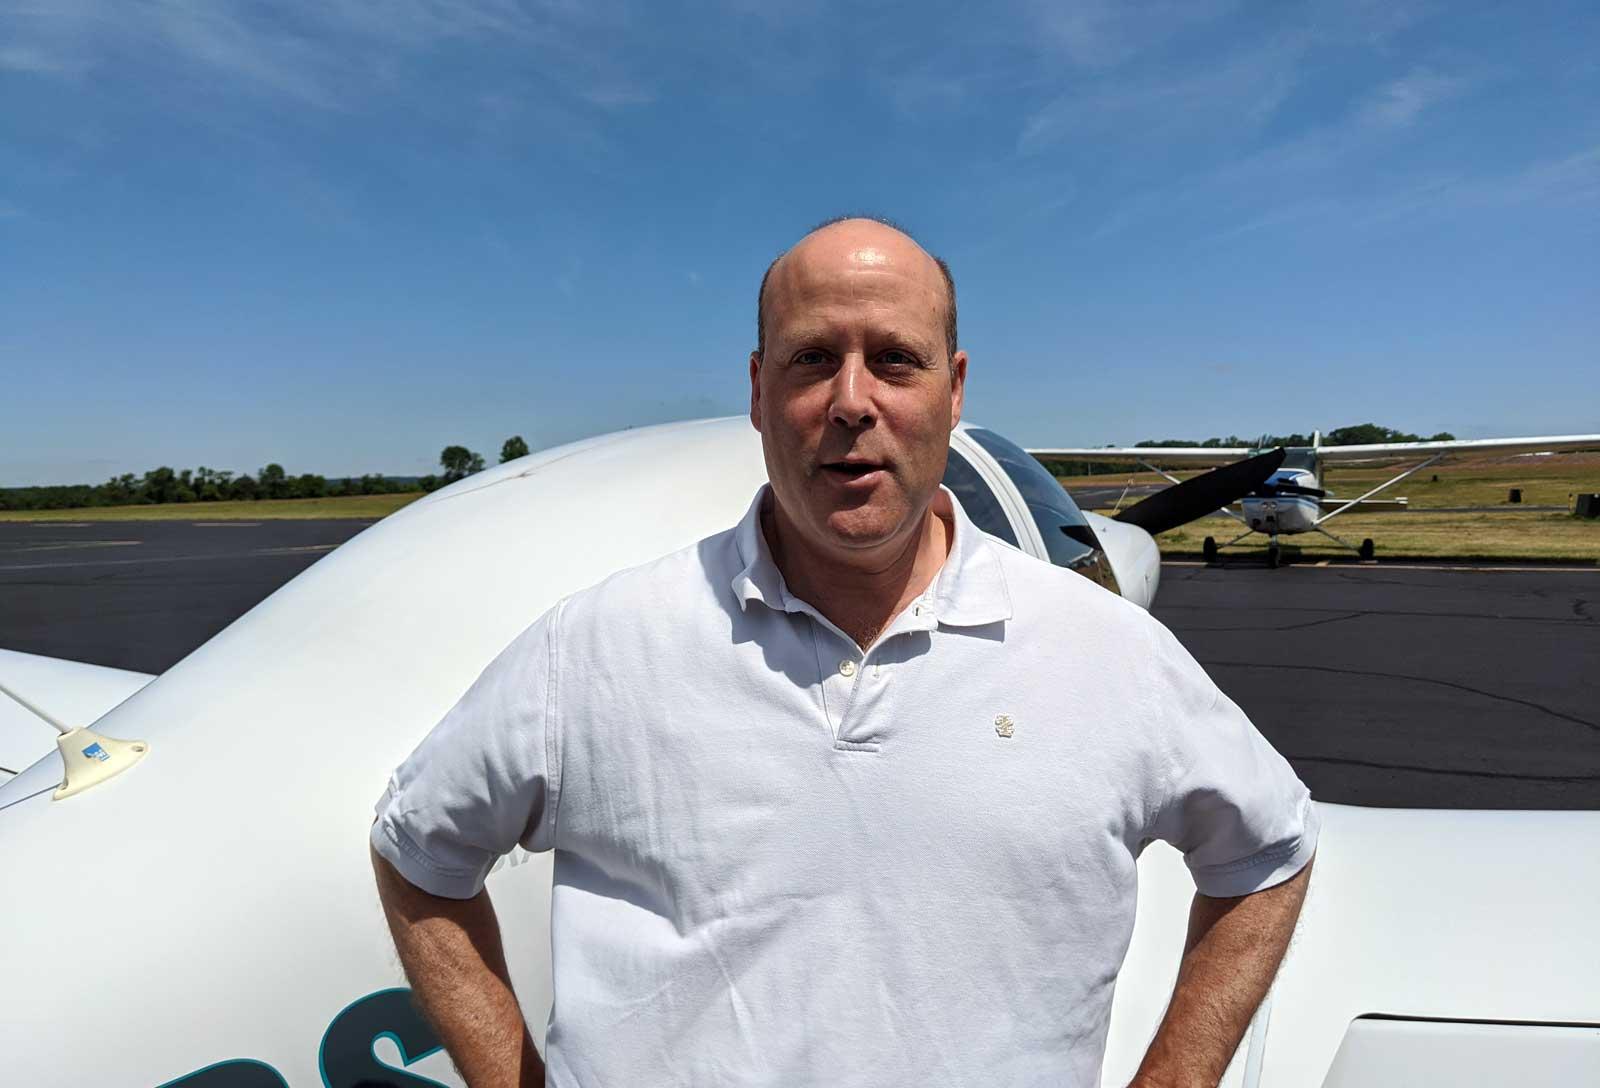 Peter Mercuro, CFI, Princeton Flying School